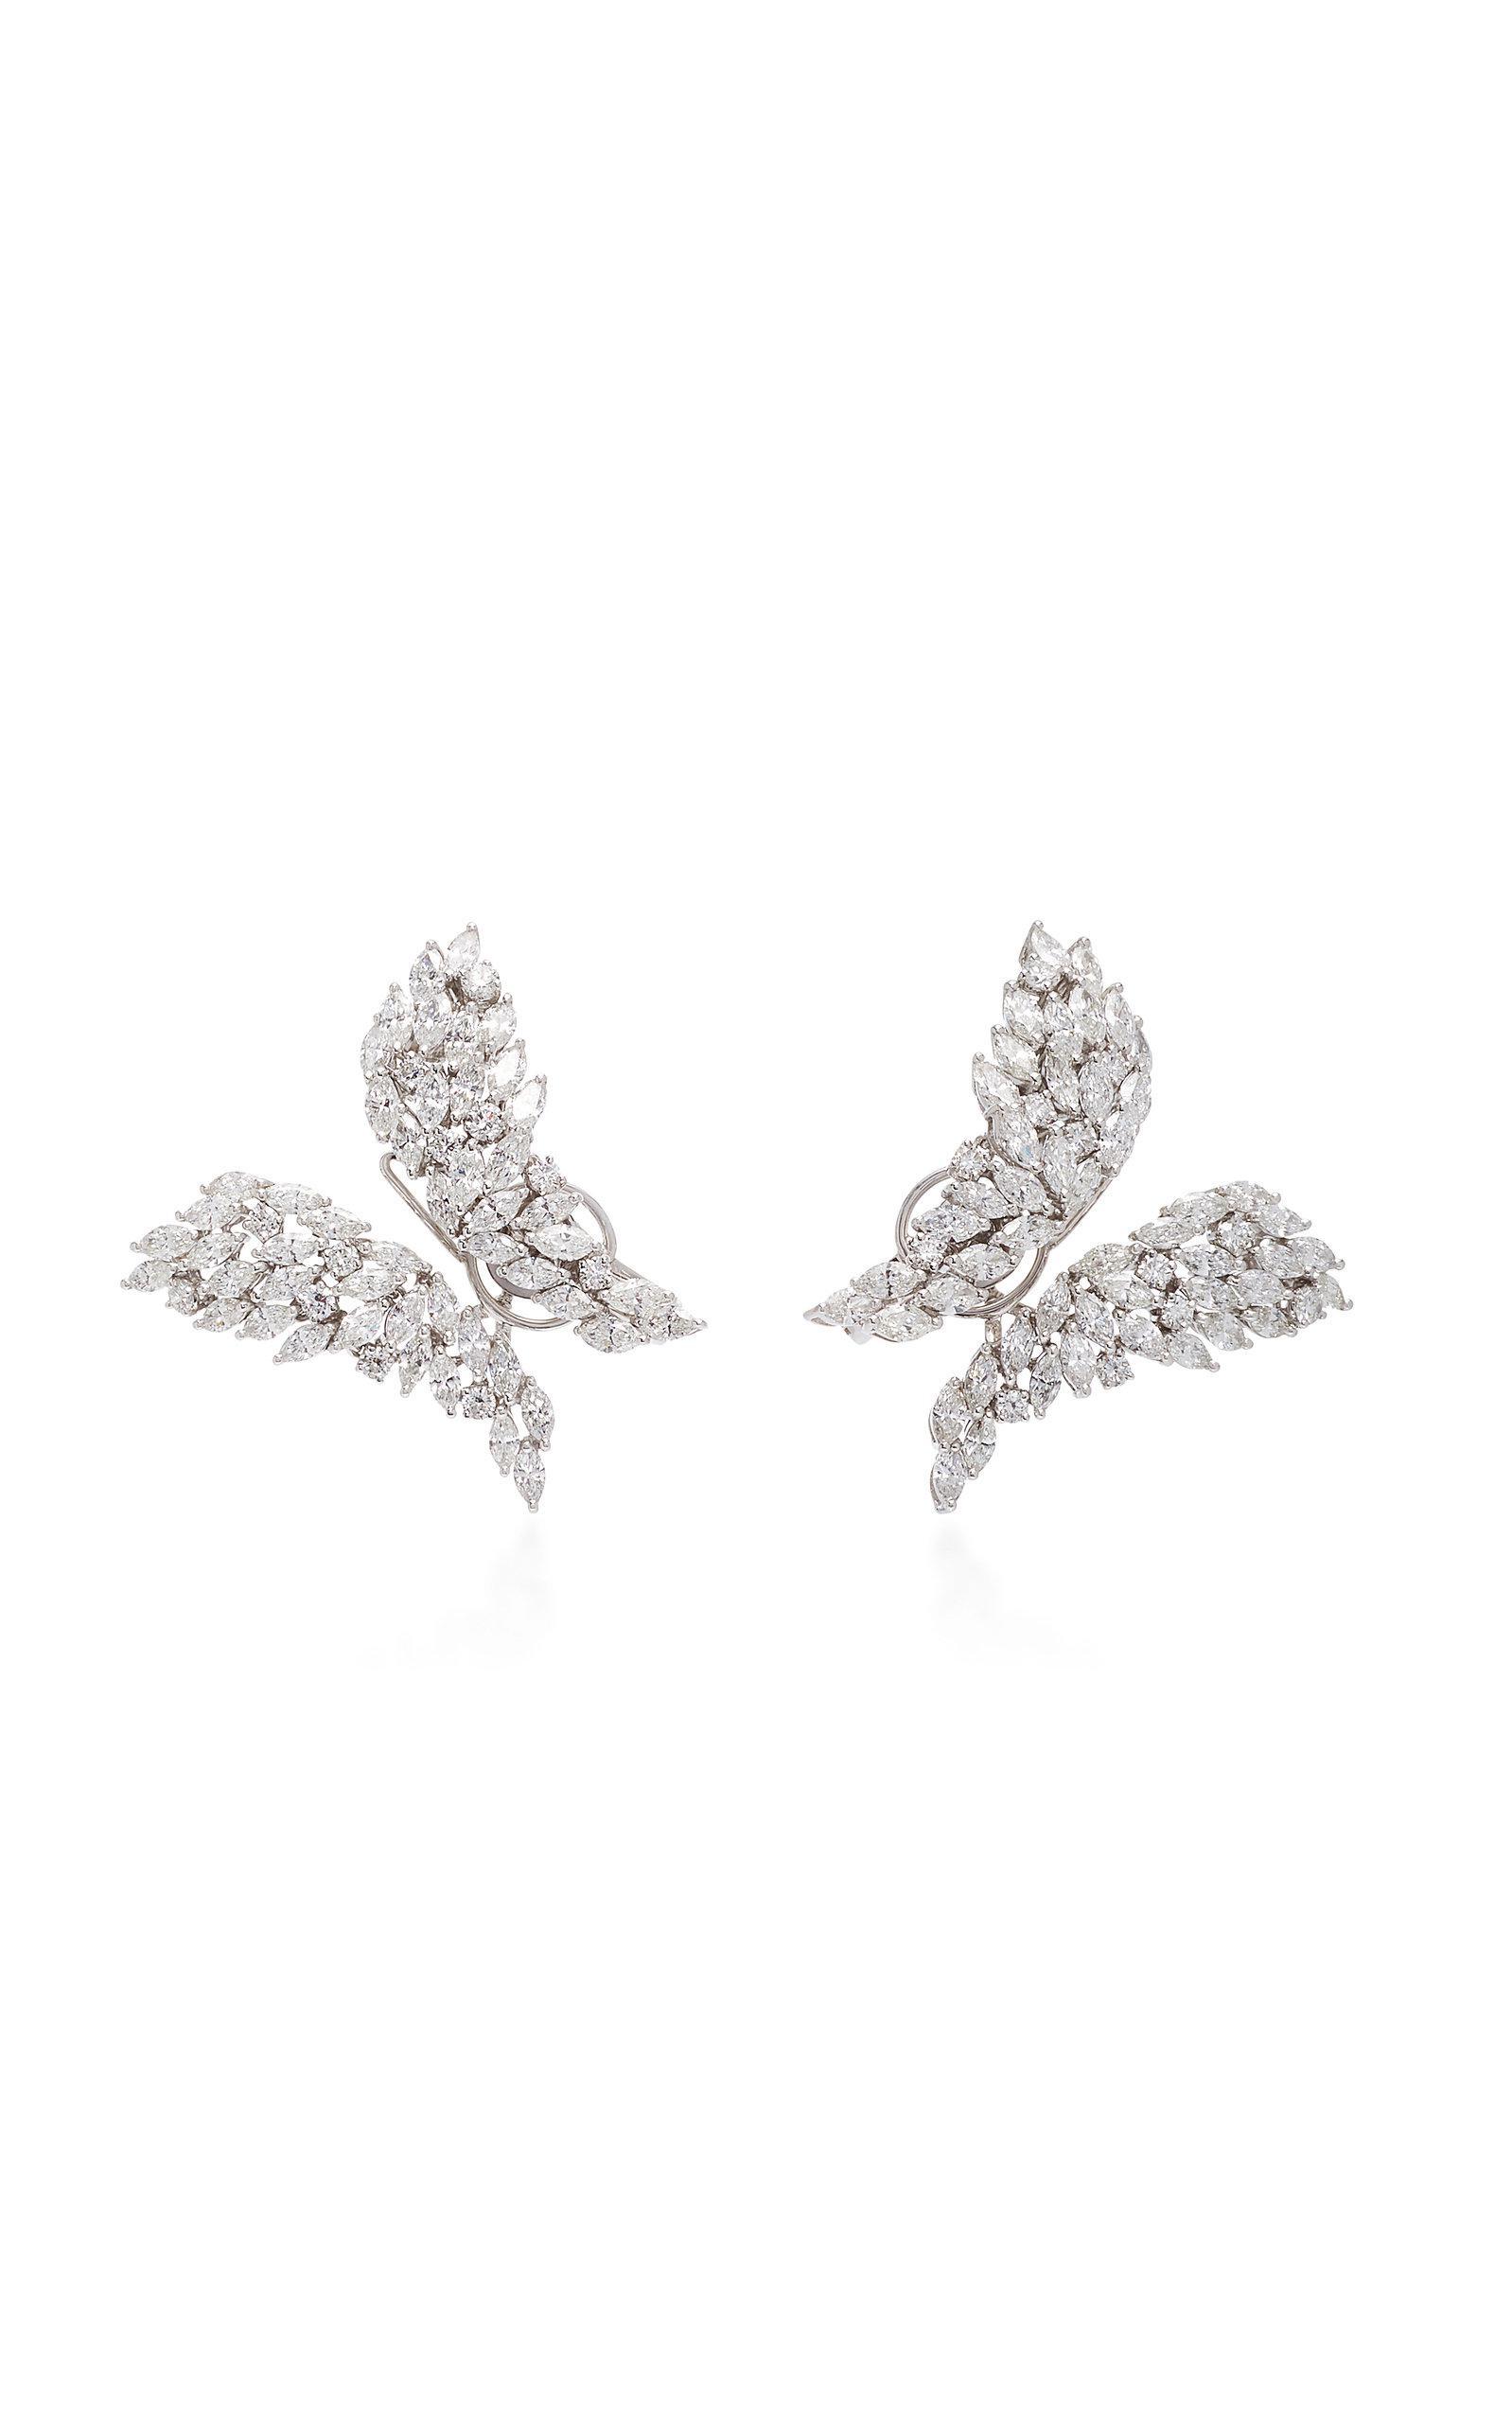 Chevalier Waterfall Earrings Yeprem 3aI6Eks2